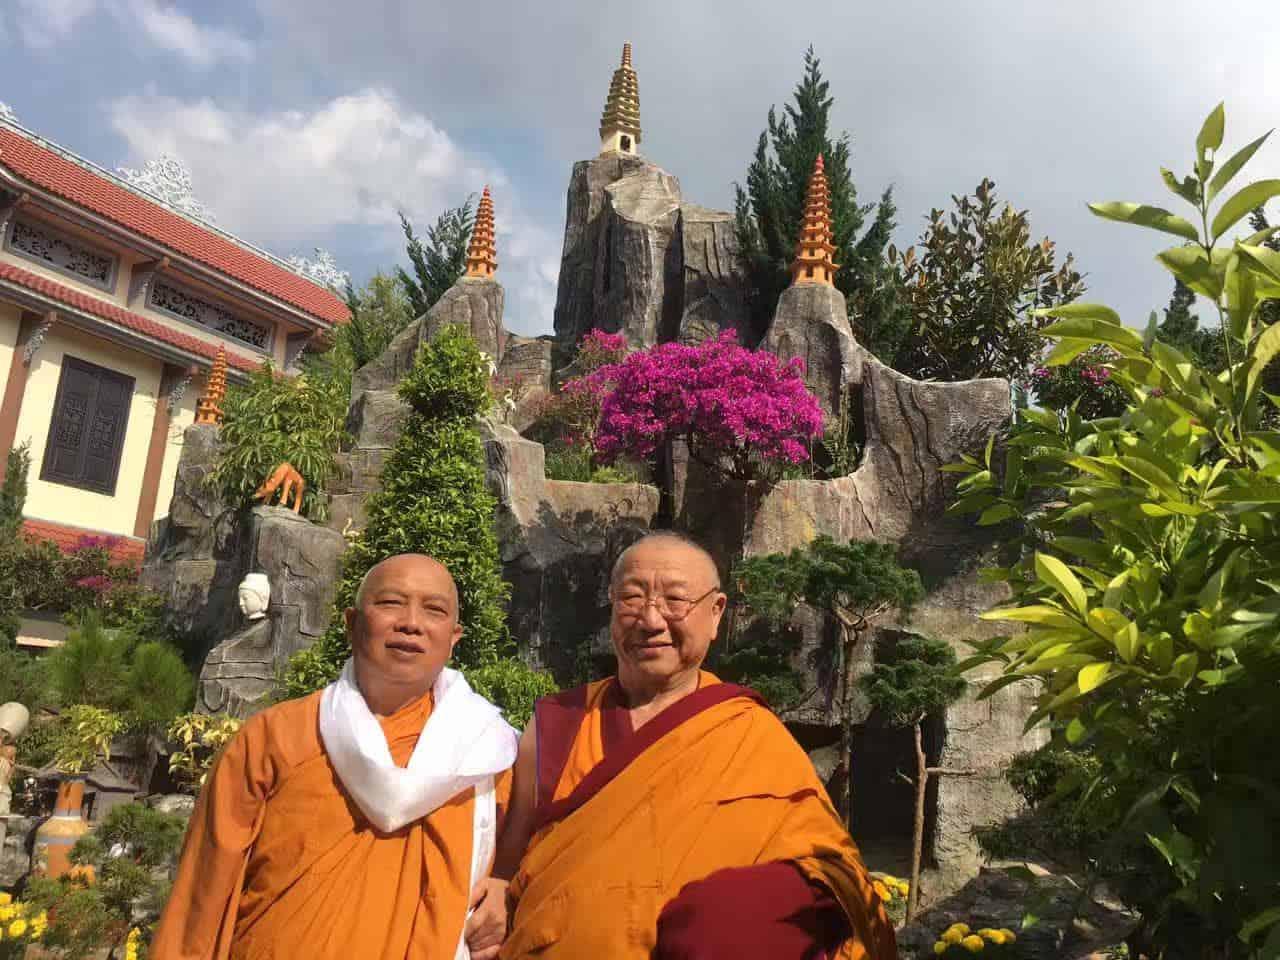 Gosok Rinpoche Vietnam 2017-03-06 e128a74535df9267eba8e6abc9532aa